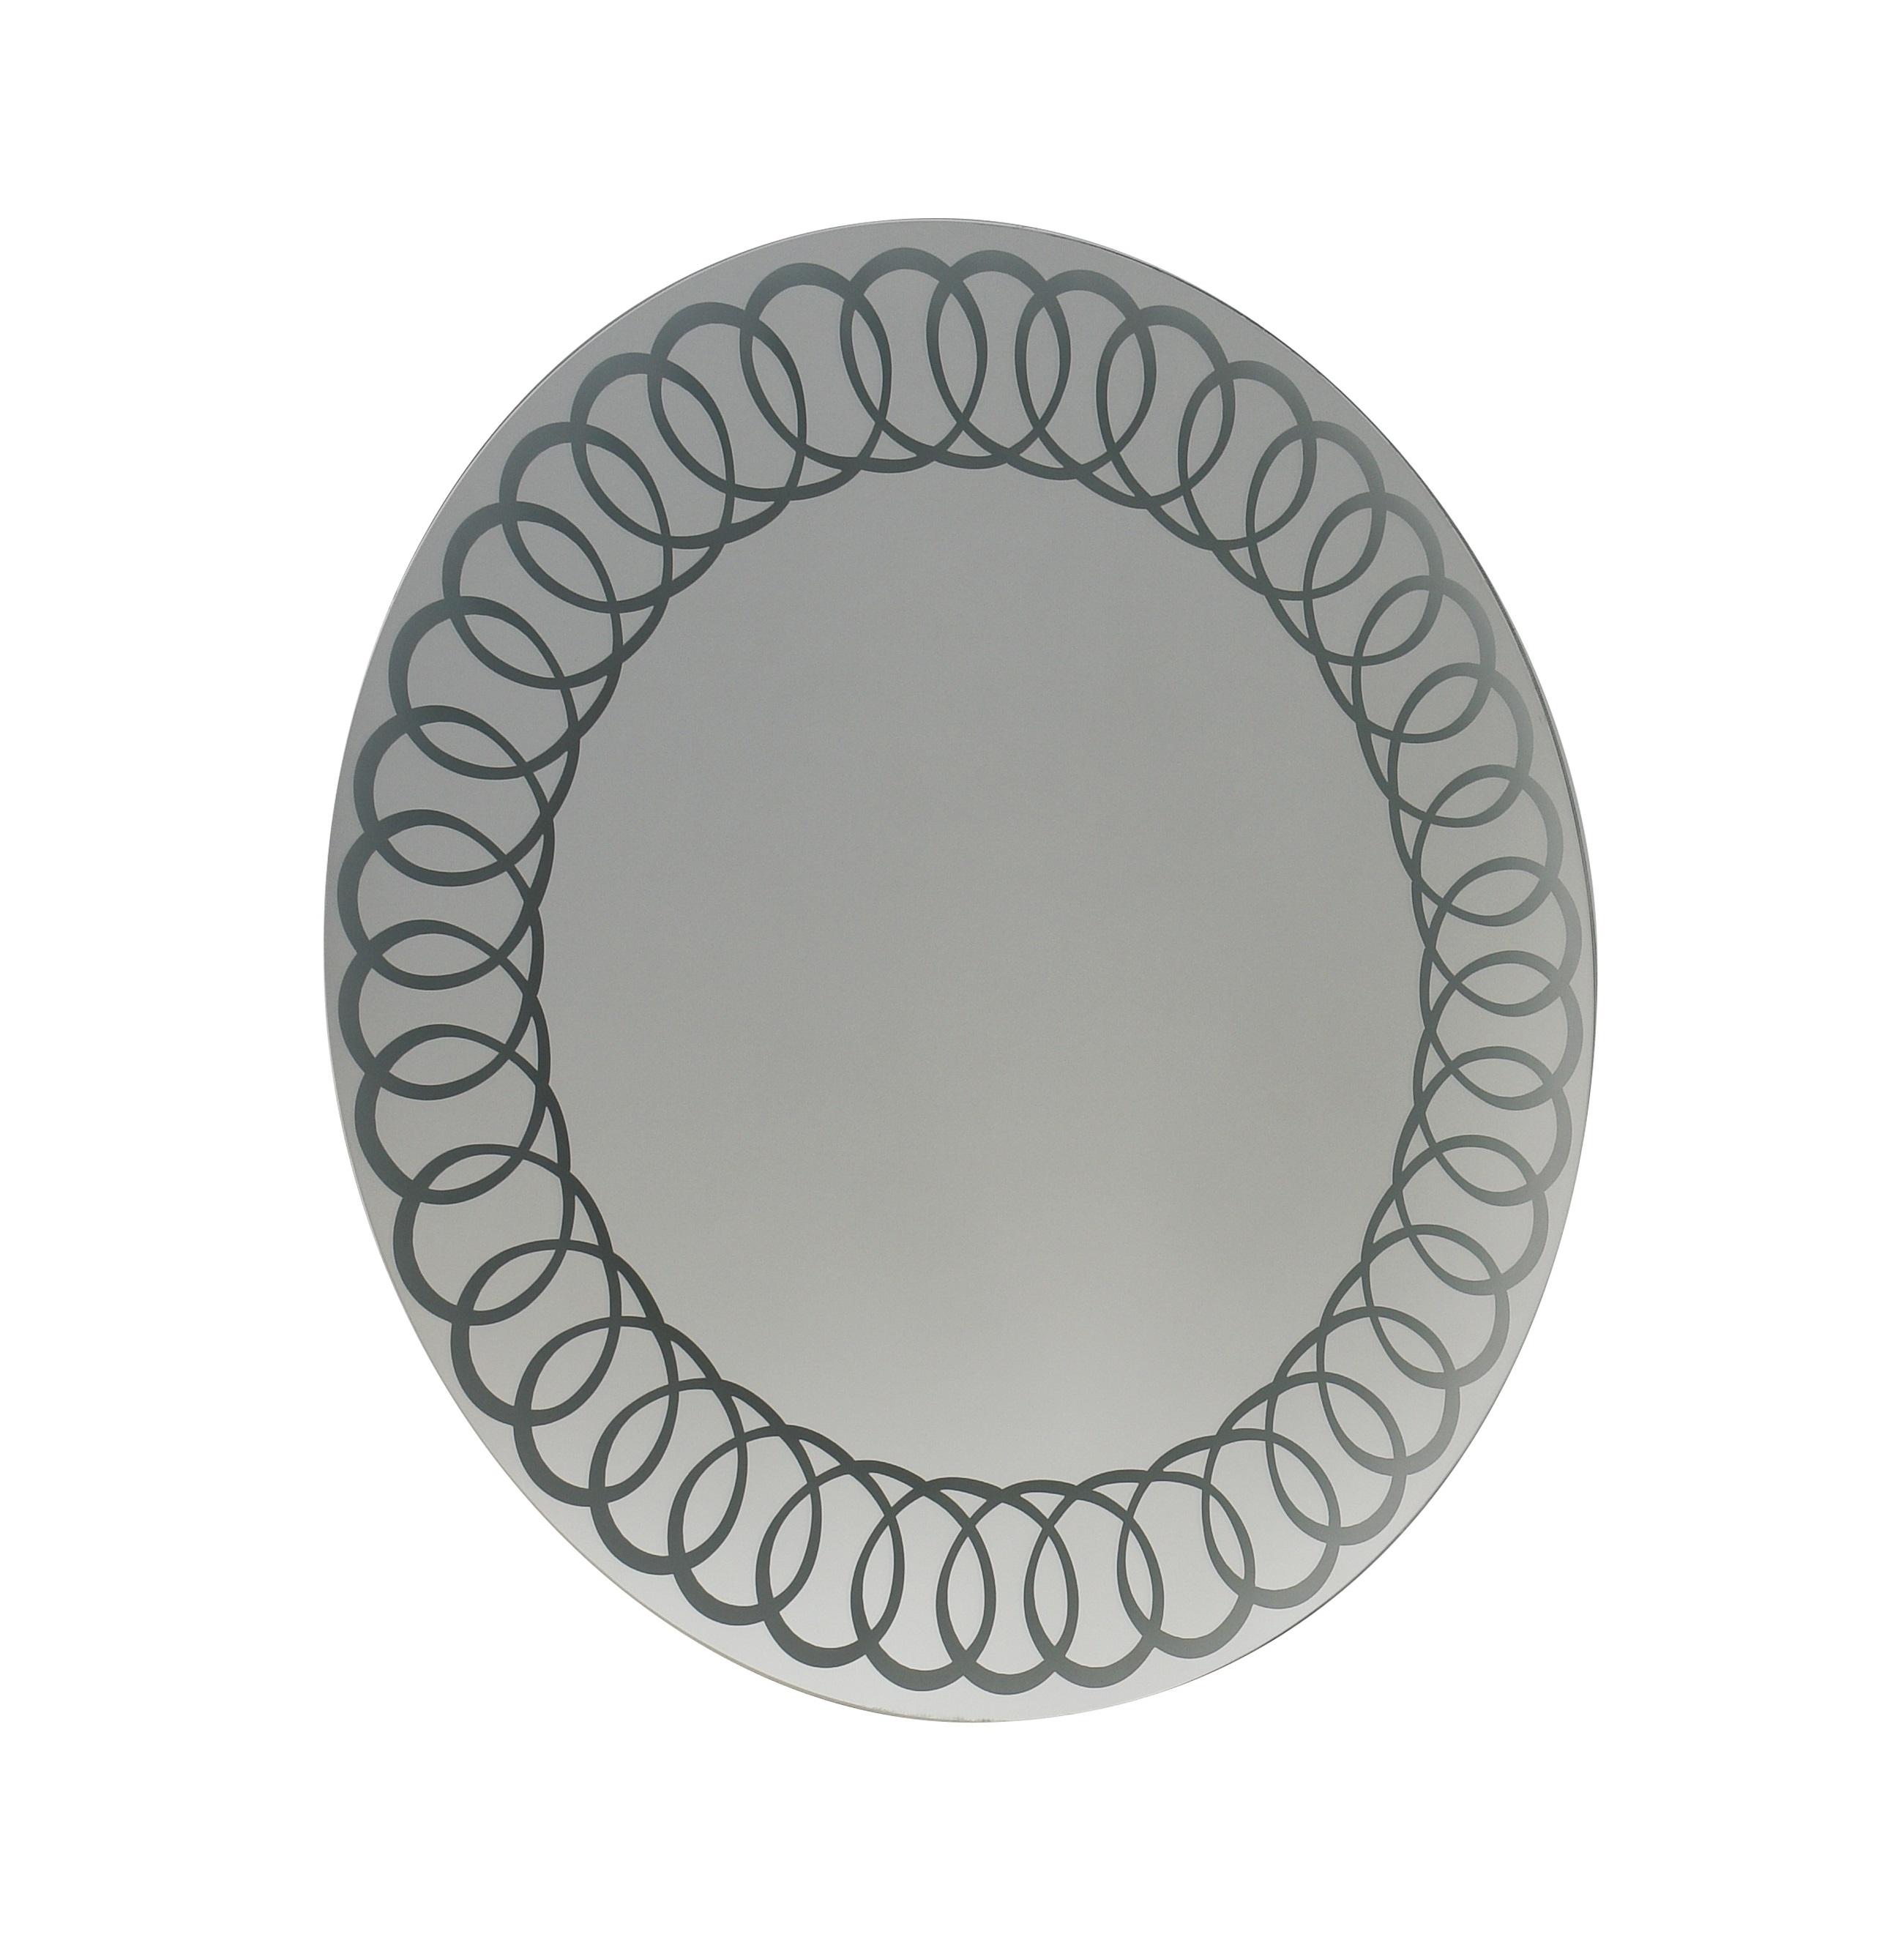 Купить Зеркало Marka One Belle 75 с подсветкой Spirate light, 1MARKA, Россия